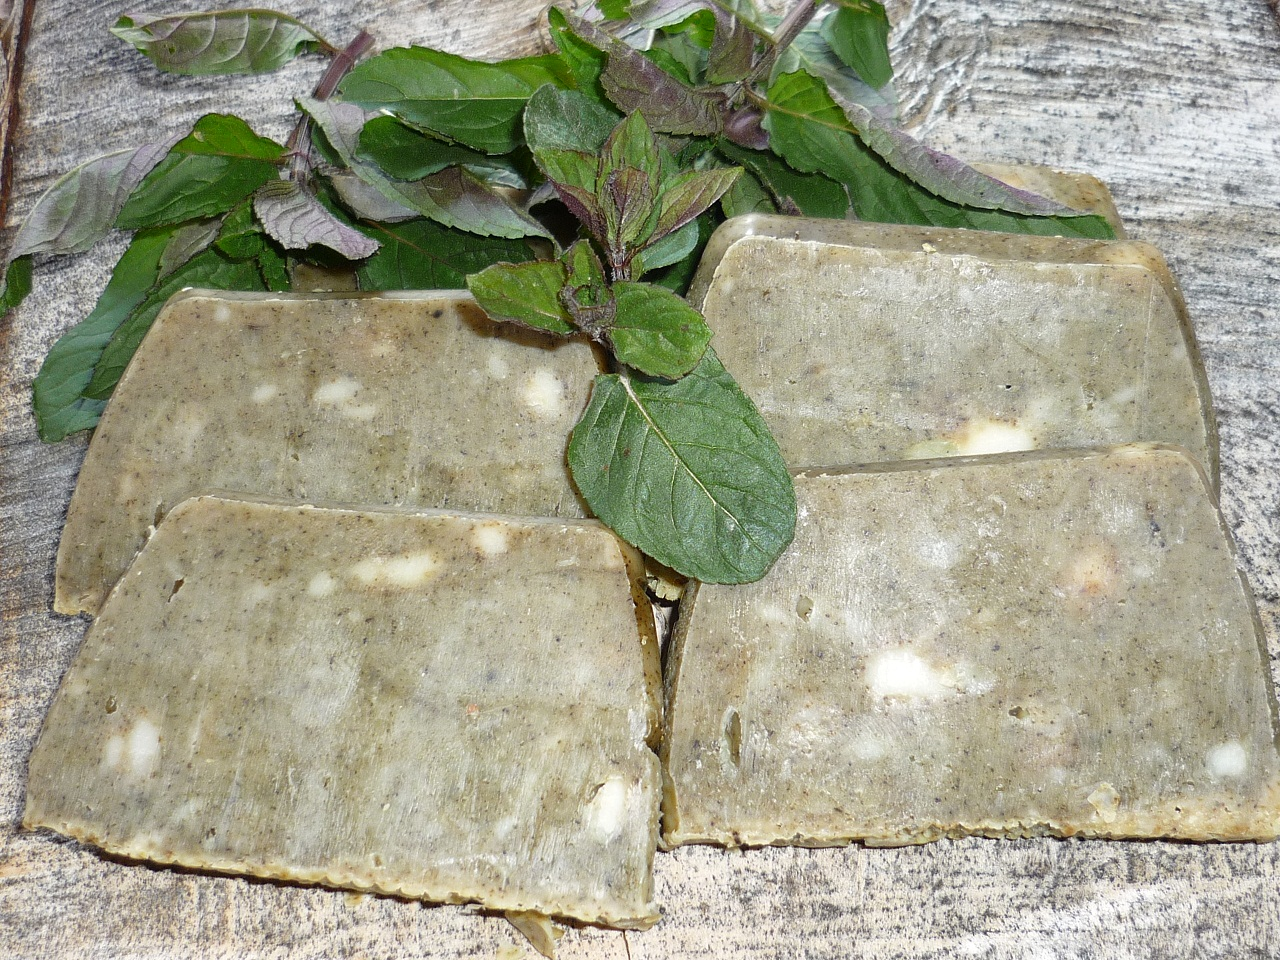 Sapun Natural Menta&Lemongras -20 lei